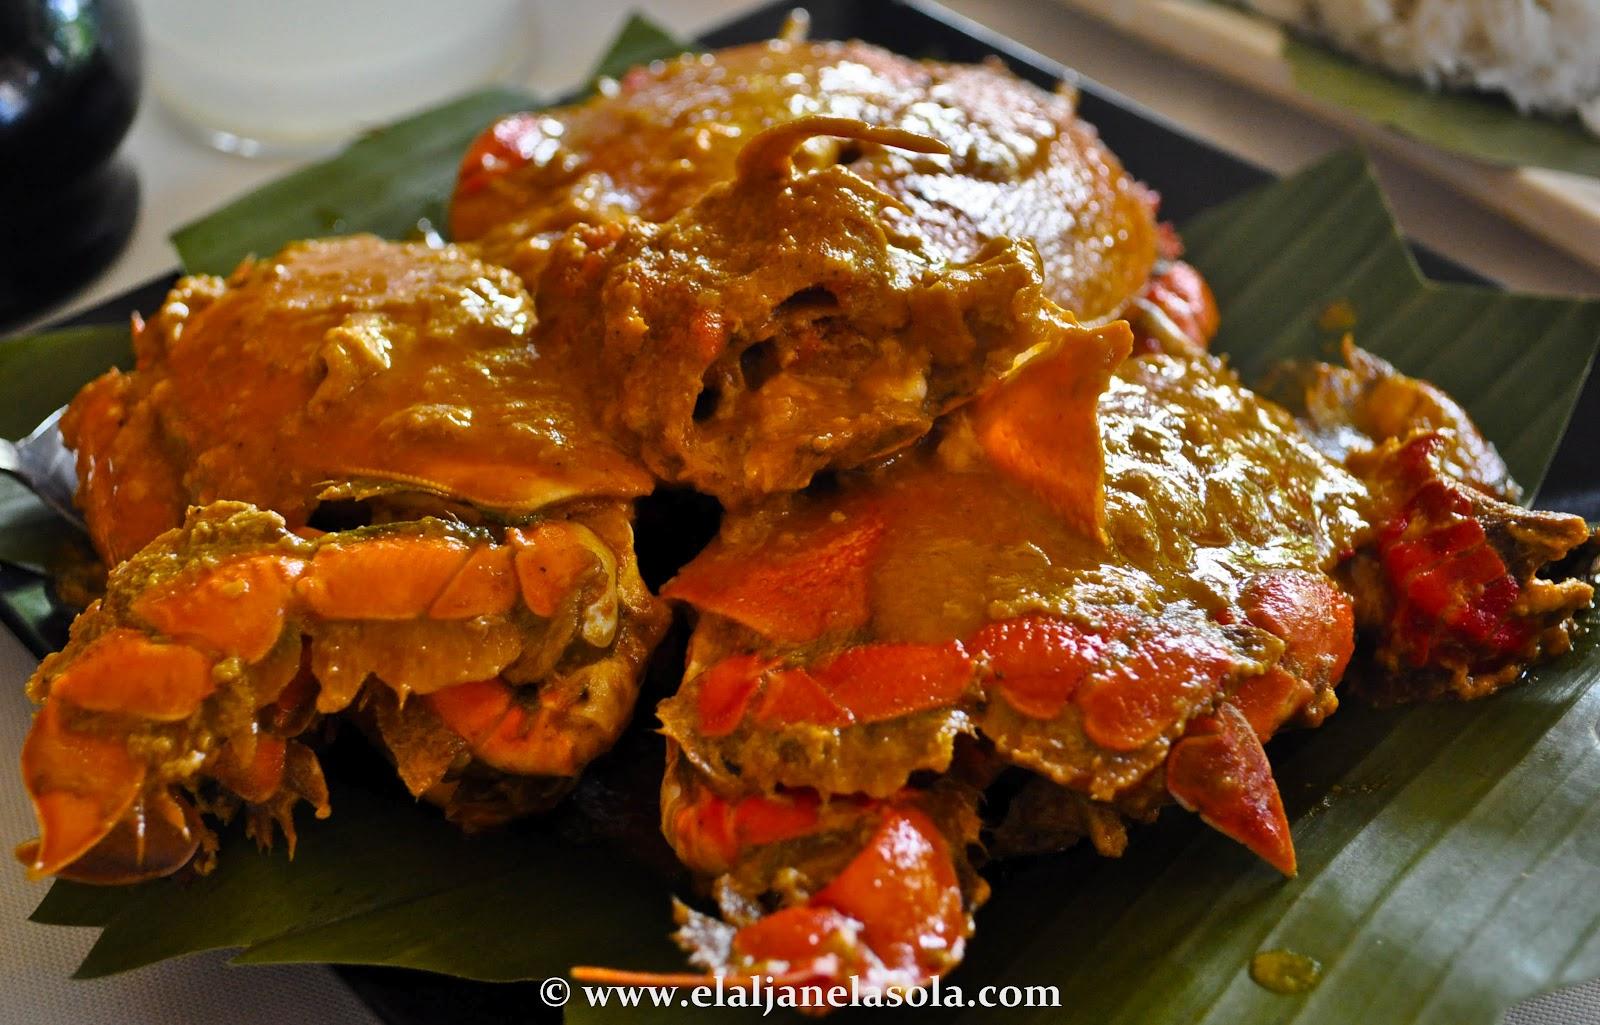 Elal Lasola Travel & Photography: Zamboanga | Curacha at Alvar Seafood Restaurant